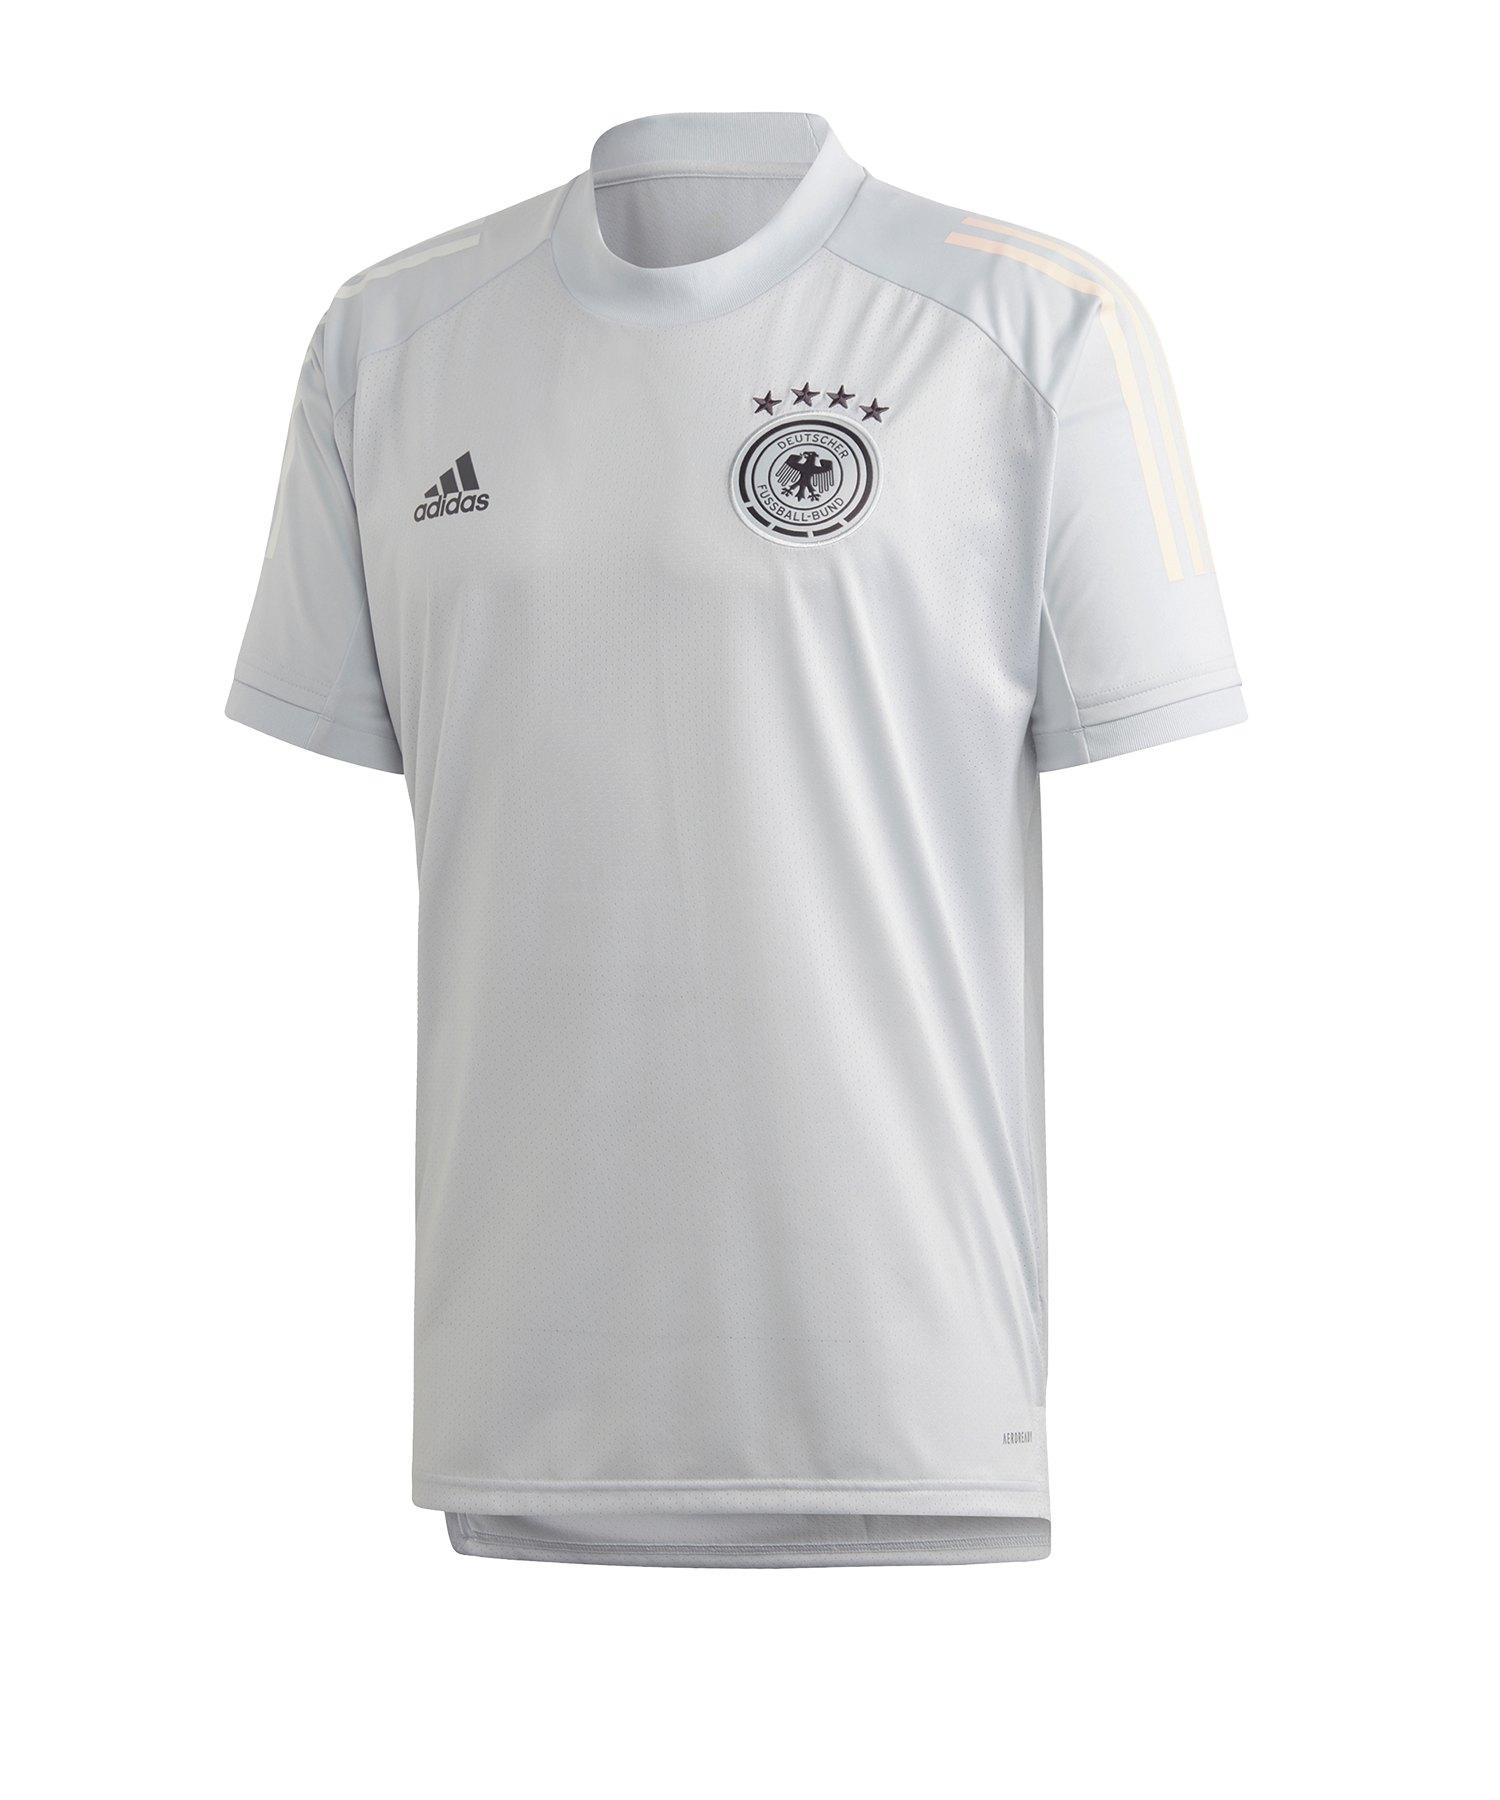 adidas DFB Deutschland Trainingsshirt Hellgrau - weiss